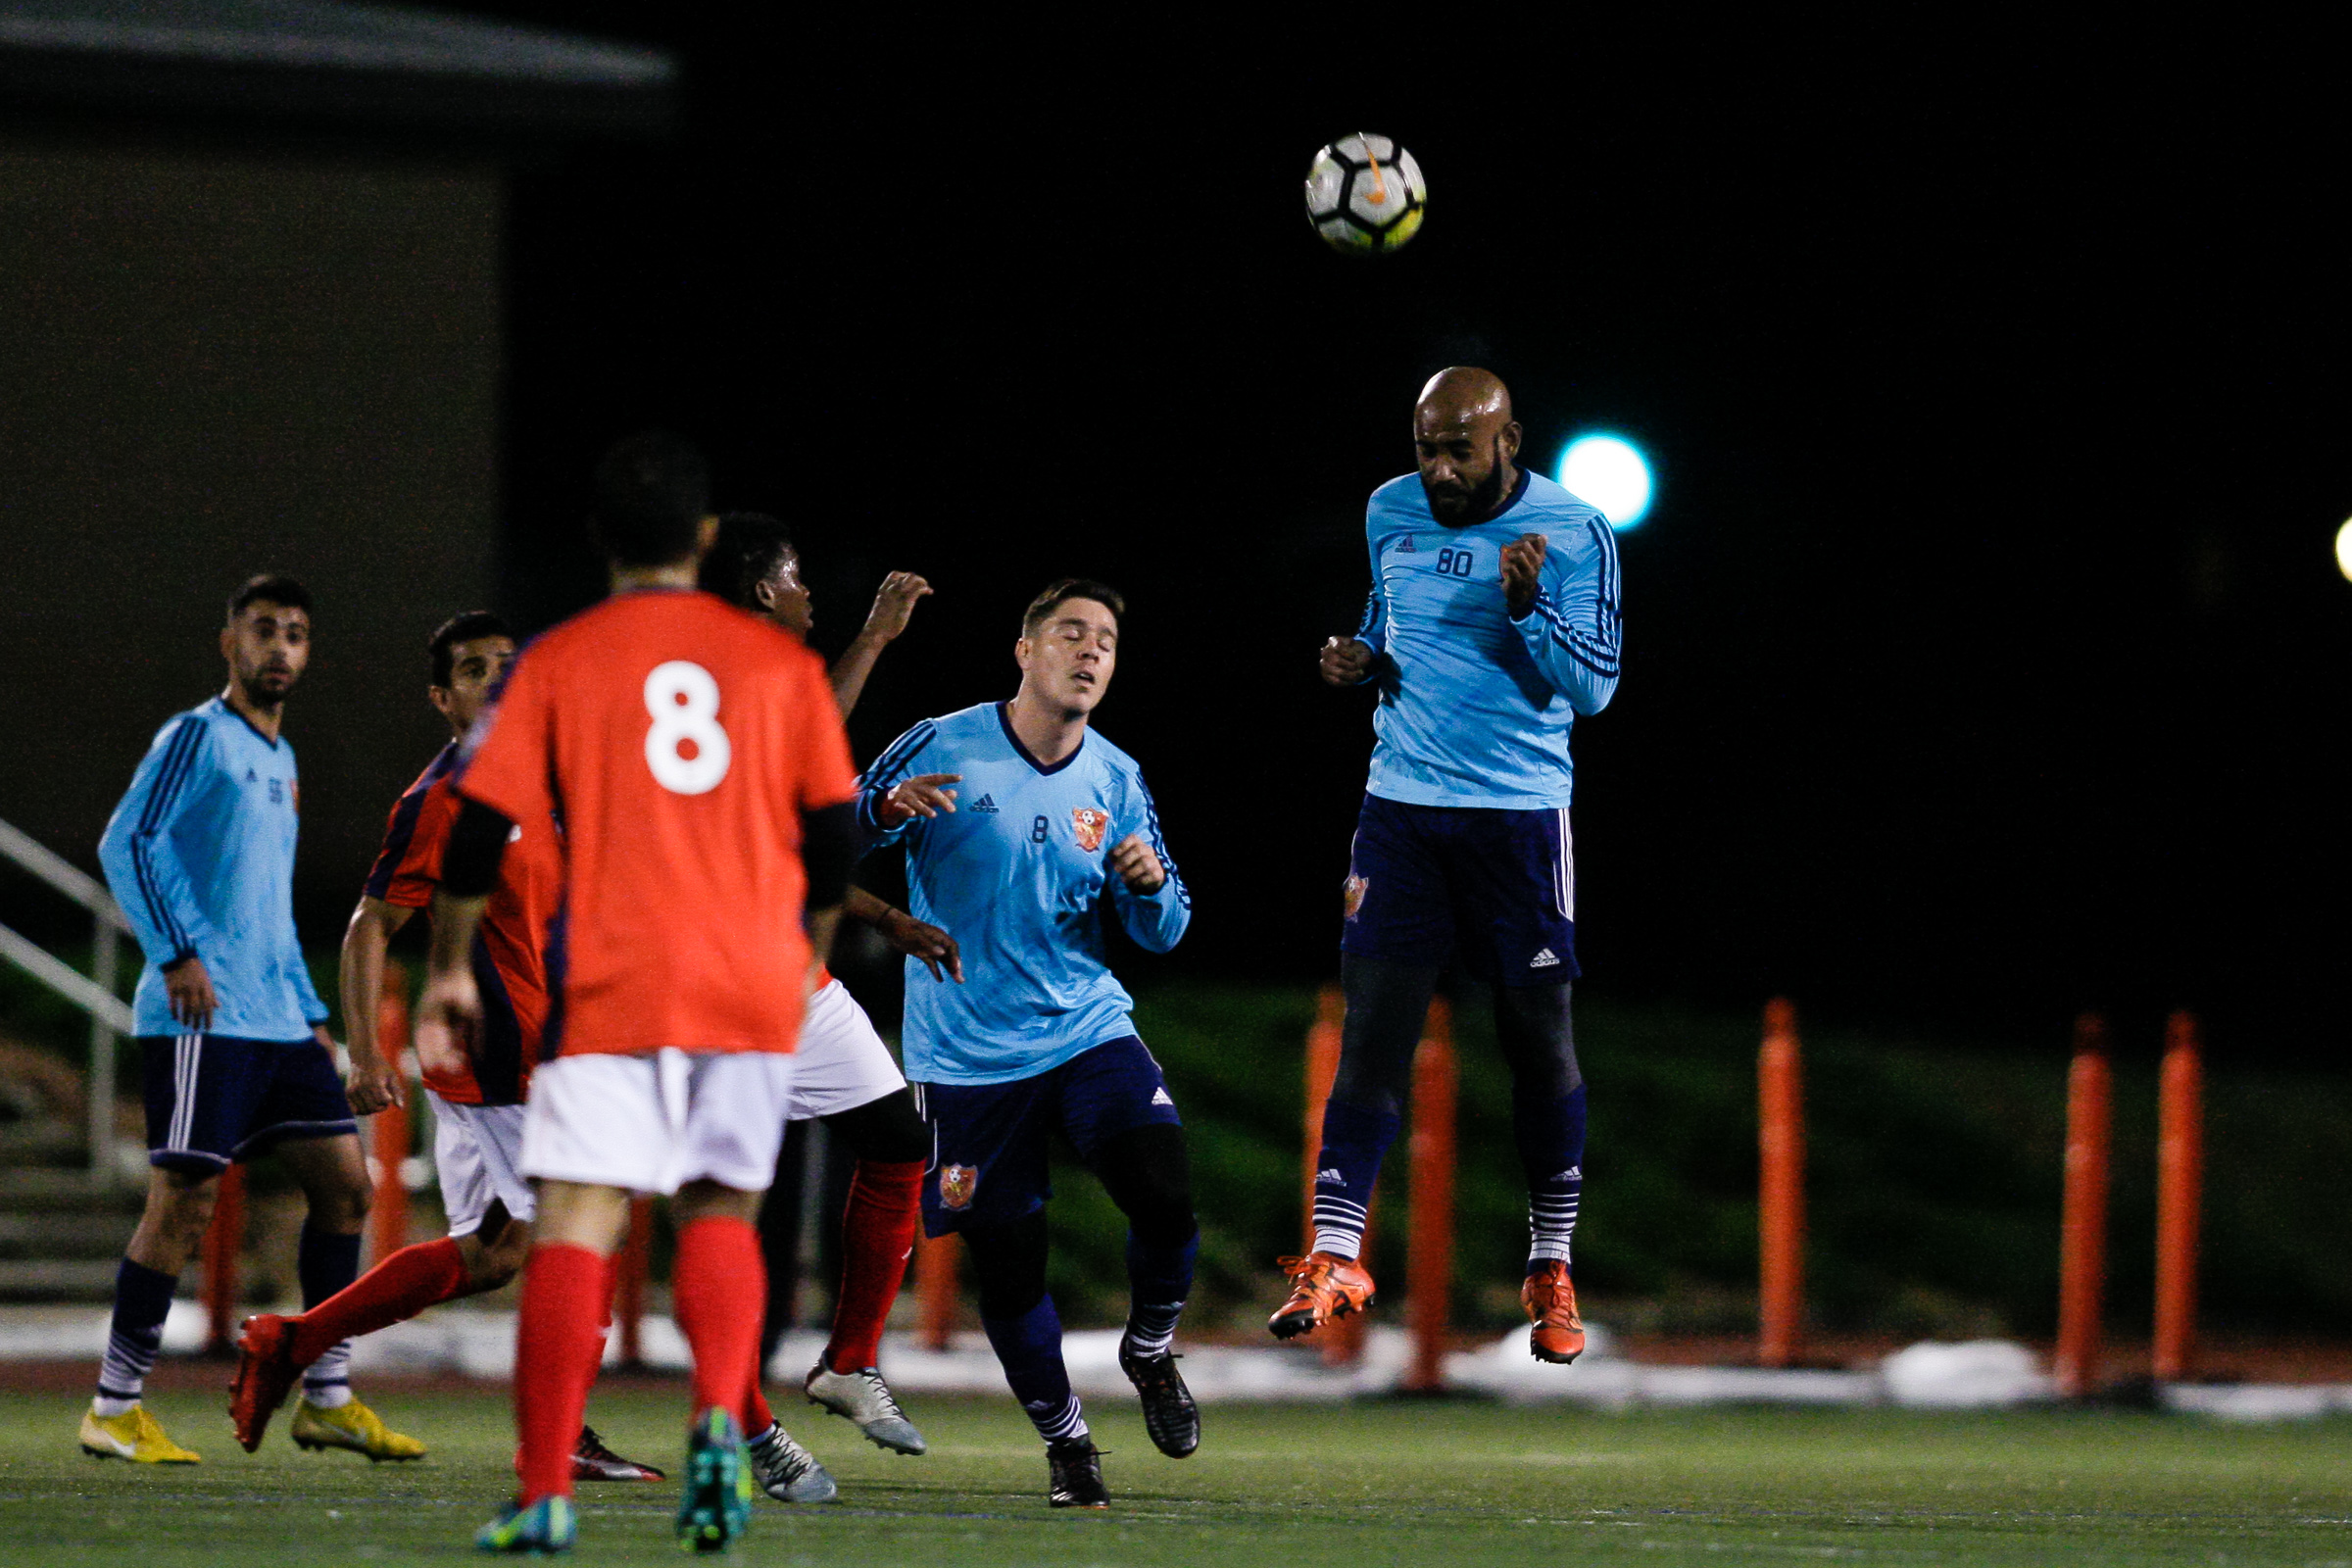 Somerville, MA: Geovane Lage Silva (Safira #80) heads the ball in traffic. Safira FC defeated Boston City FC 4-1 in a 2019 Lamar Hunt U.S. Open Cup game on October 20, 2018. (c) Burt Granofsky